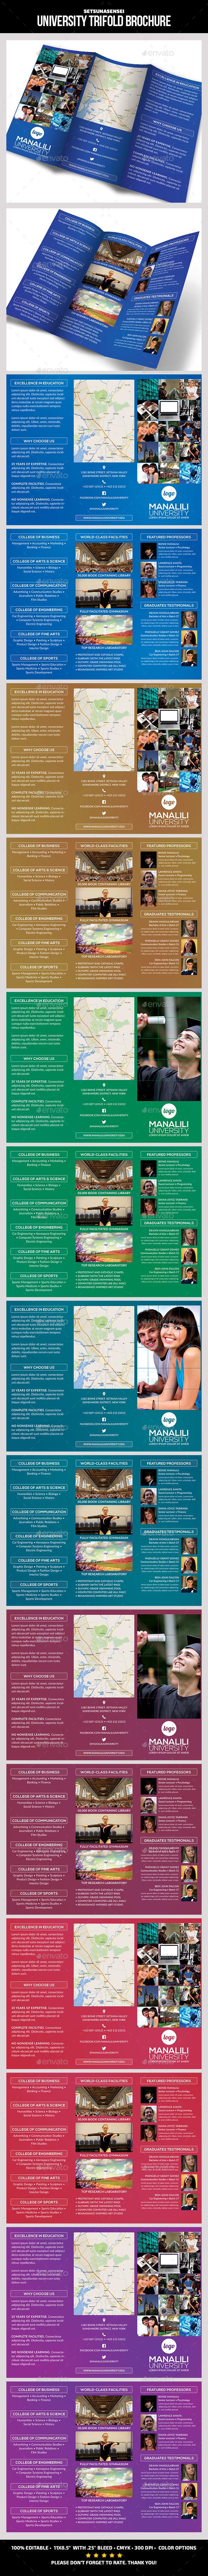 University Trifold Brochure - Corporate Brochures